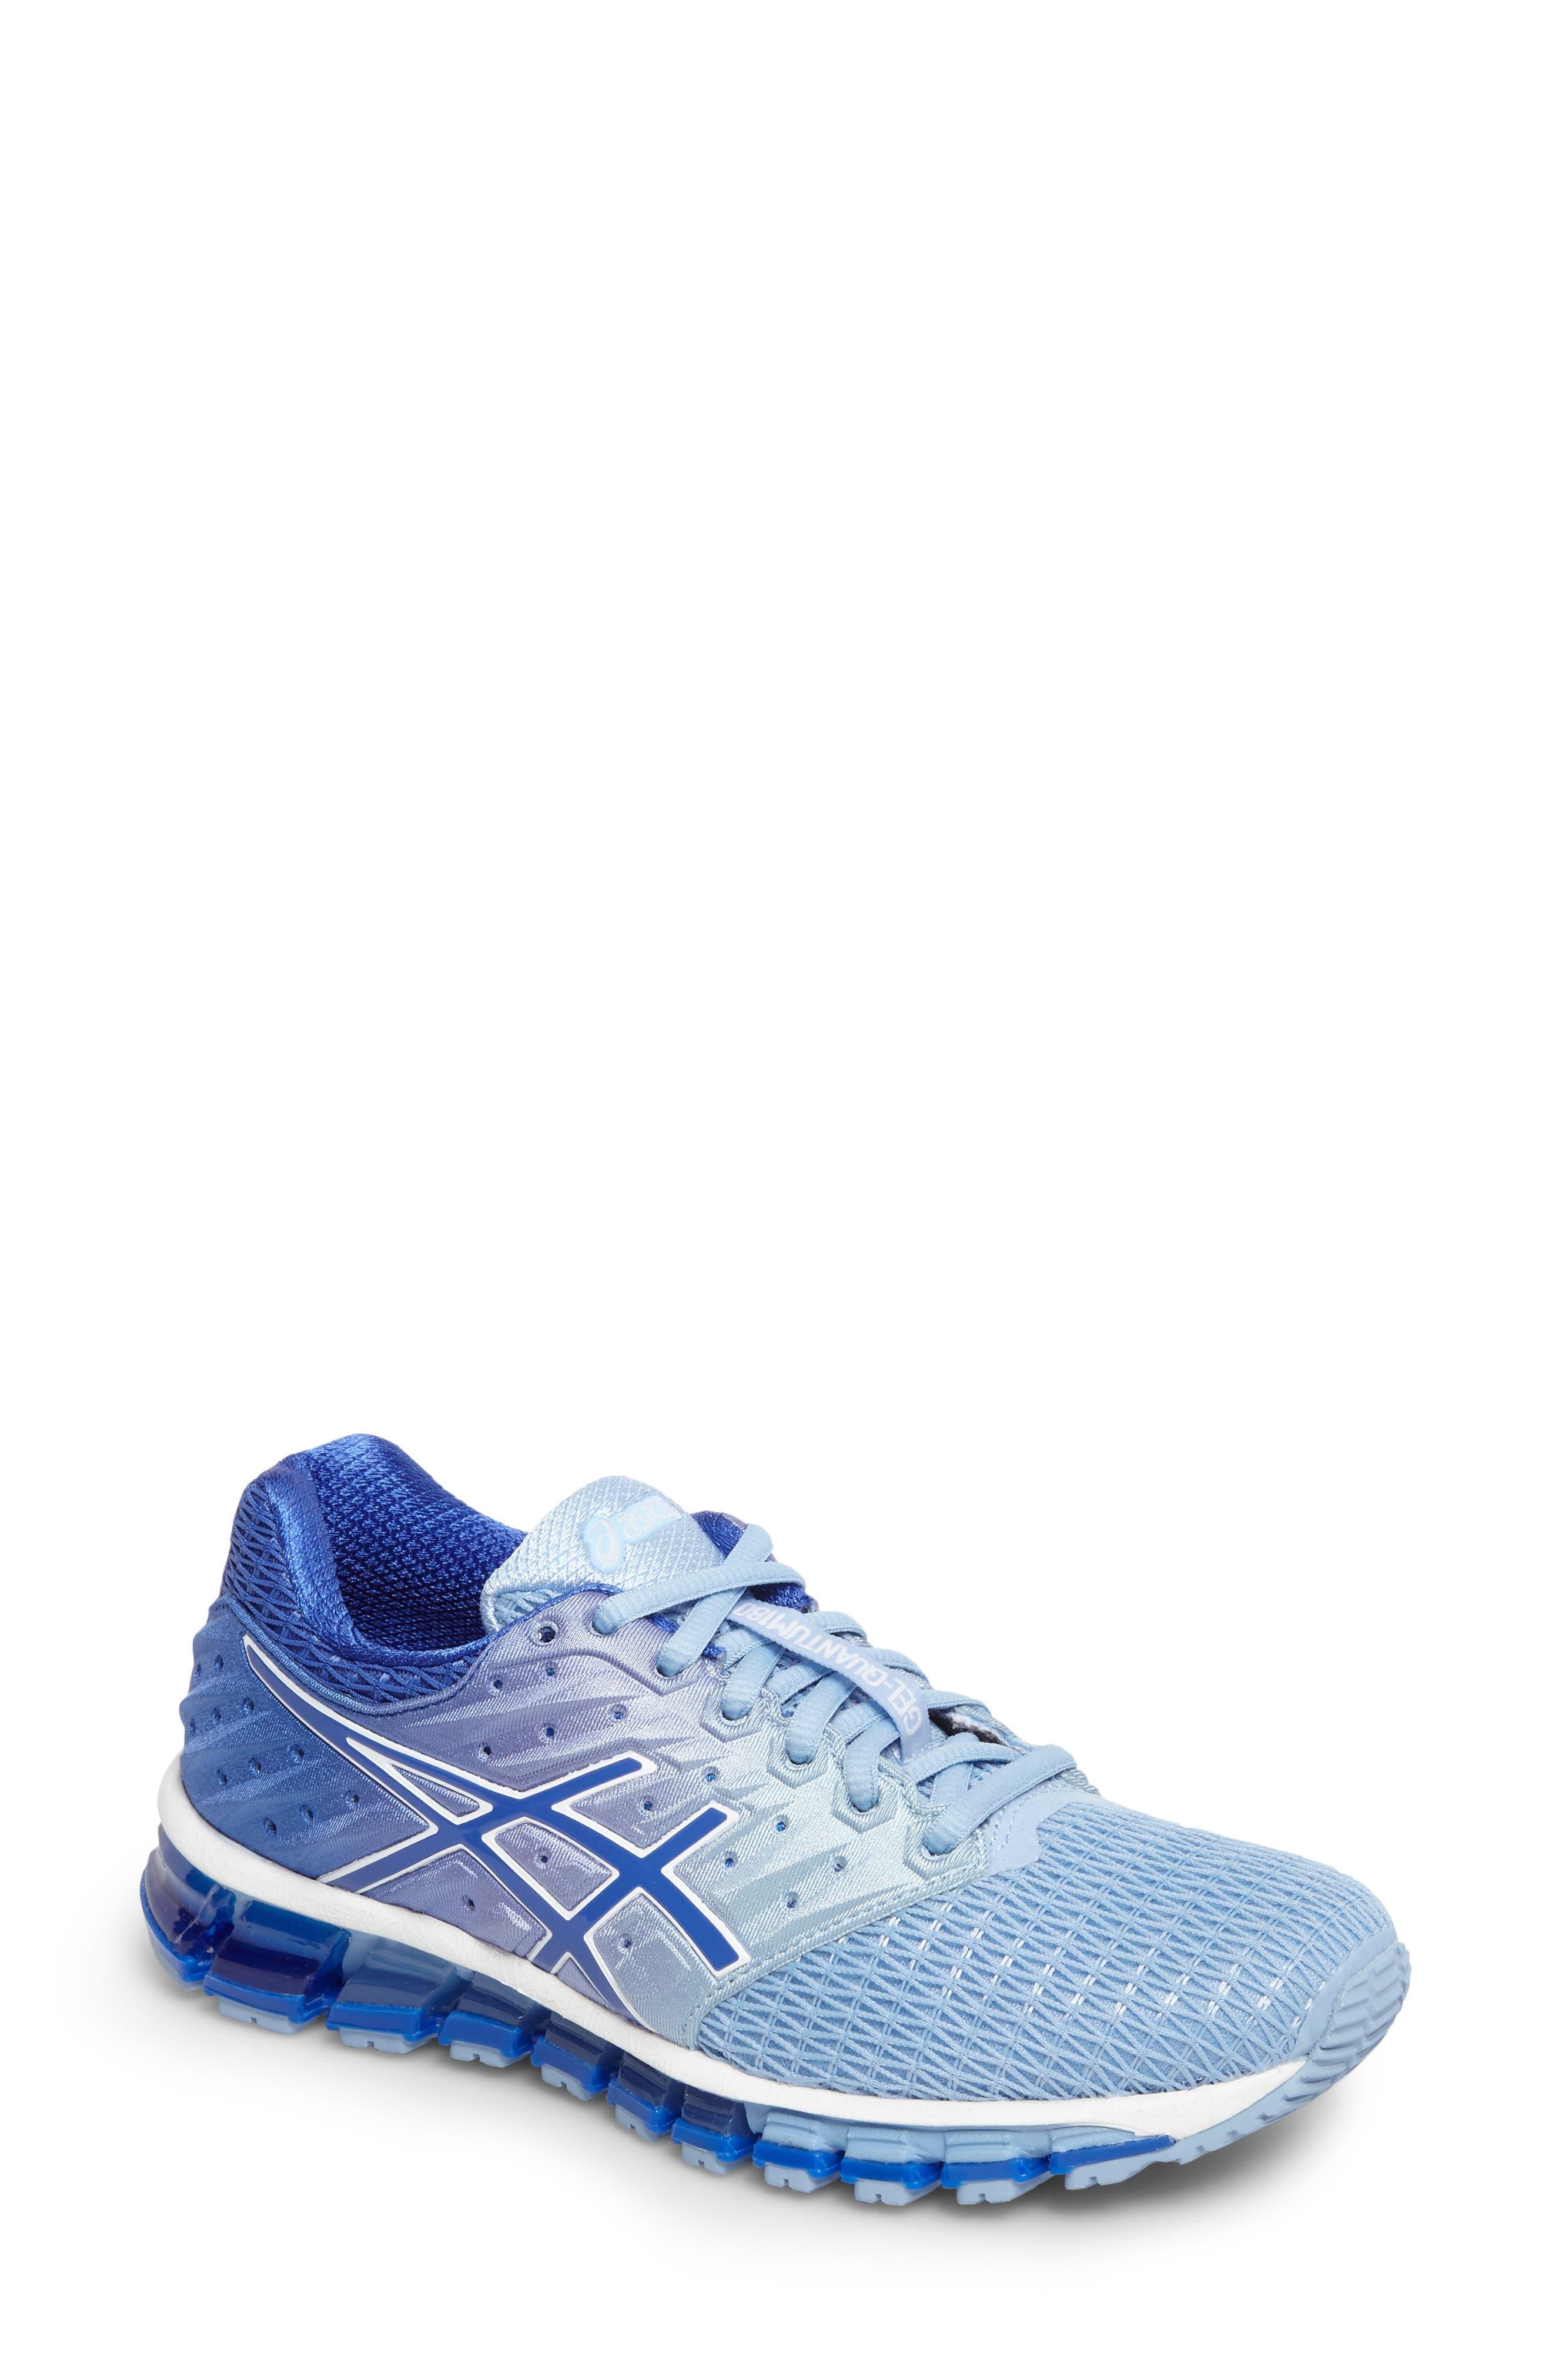 Main Image - ASICS® 'GEL-Quantum 180 2' Running Shoe (Women)